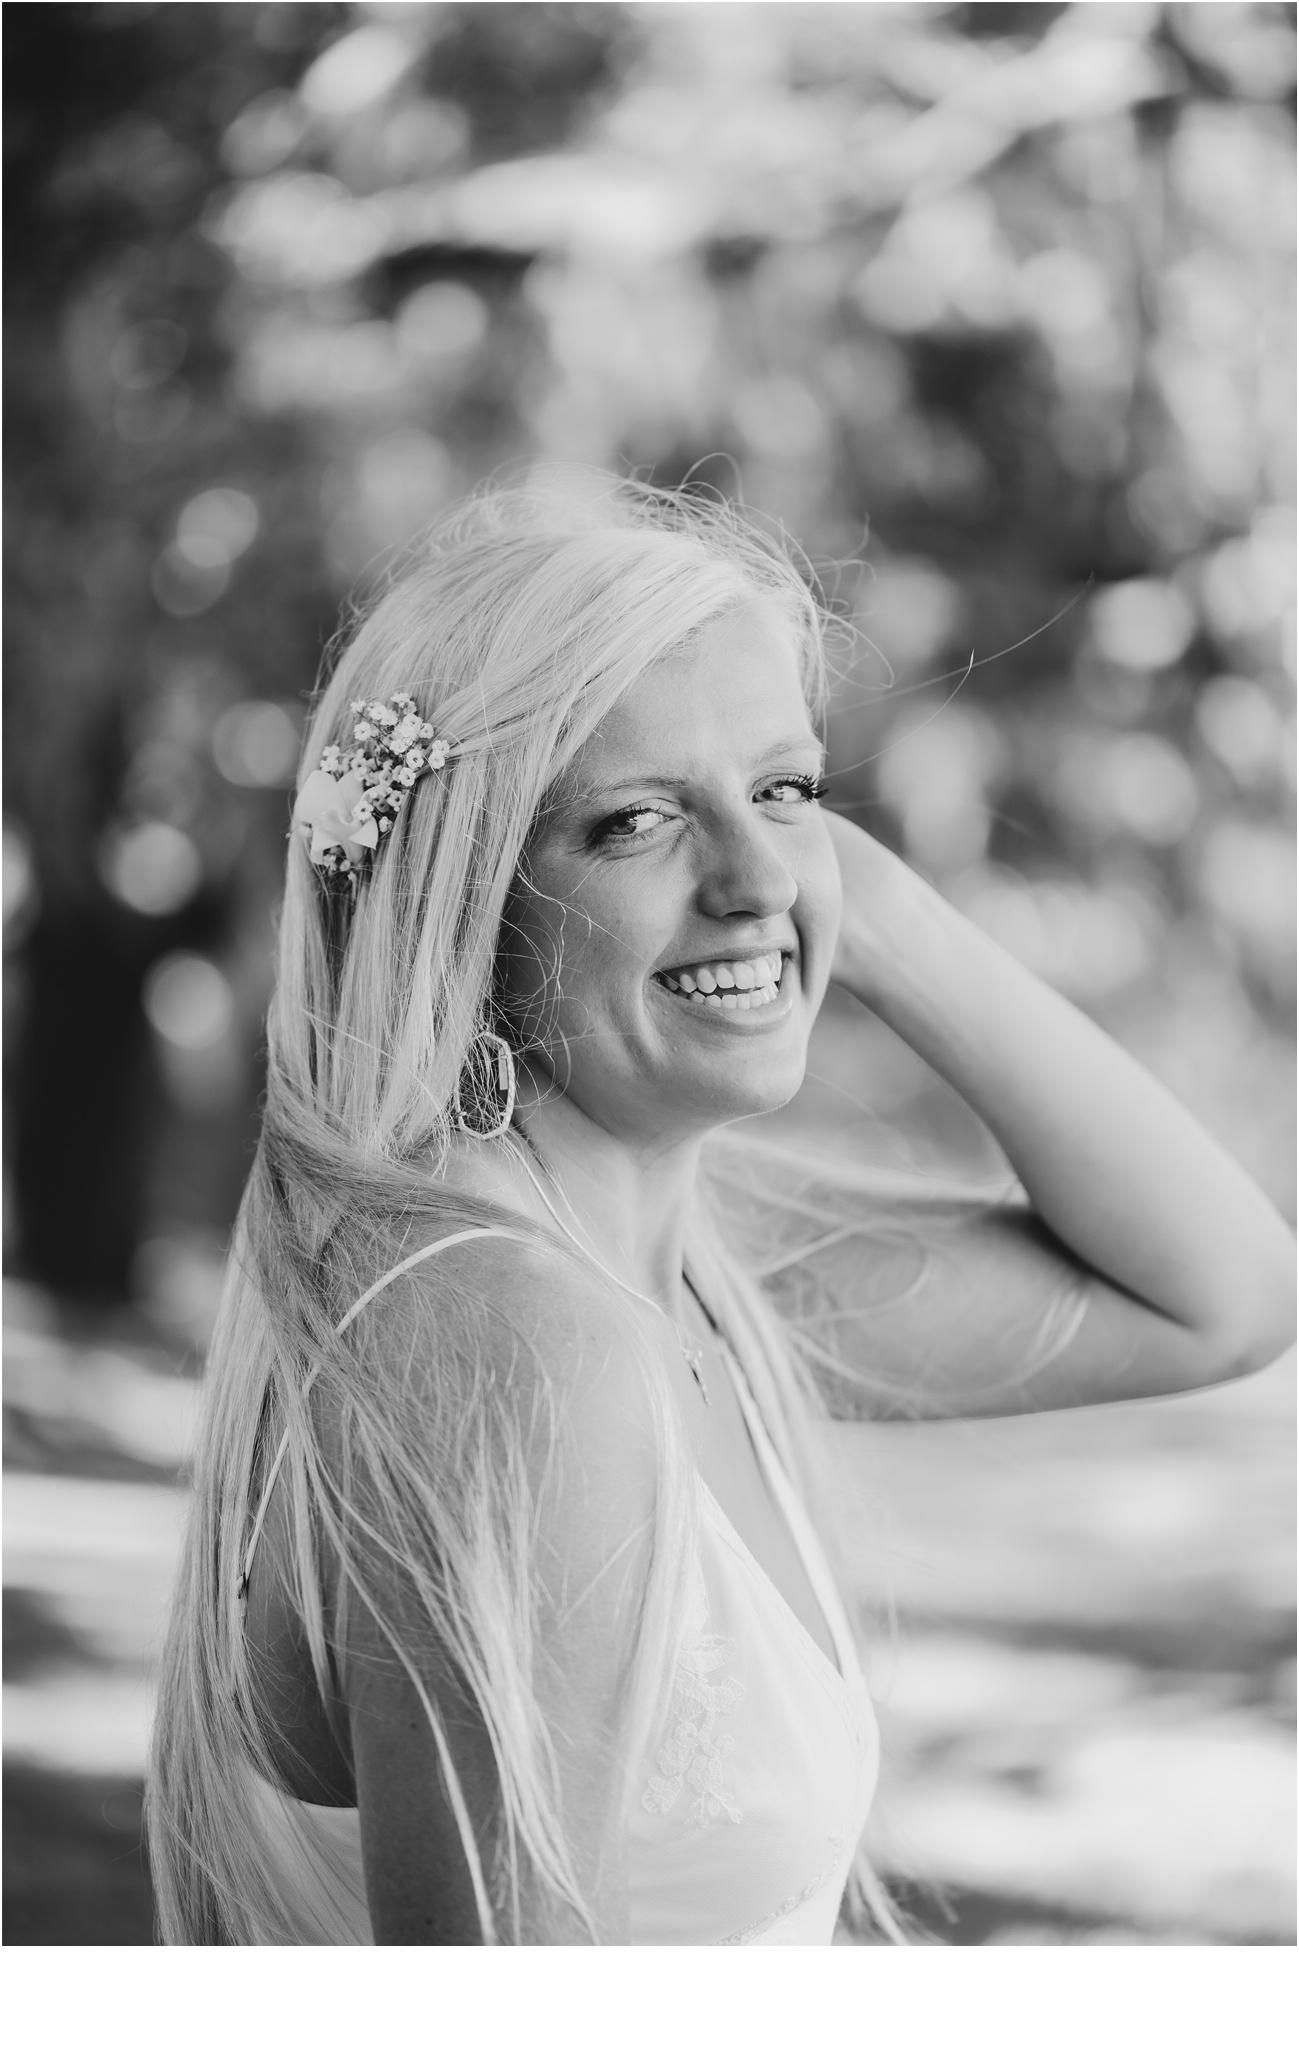 Rainey_Gregg_Photography_St._Simons_Island_Georgia_California_Wedding_Portrait_Photography_1119.jpg